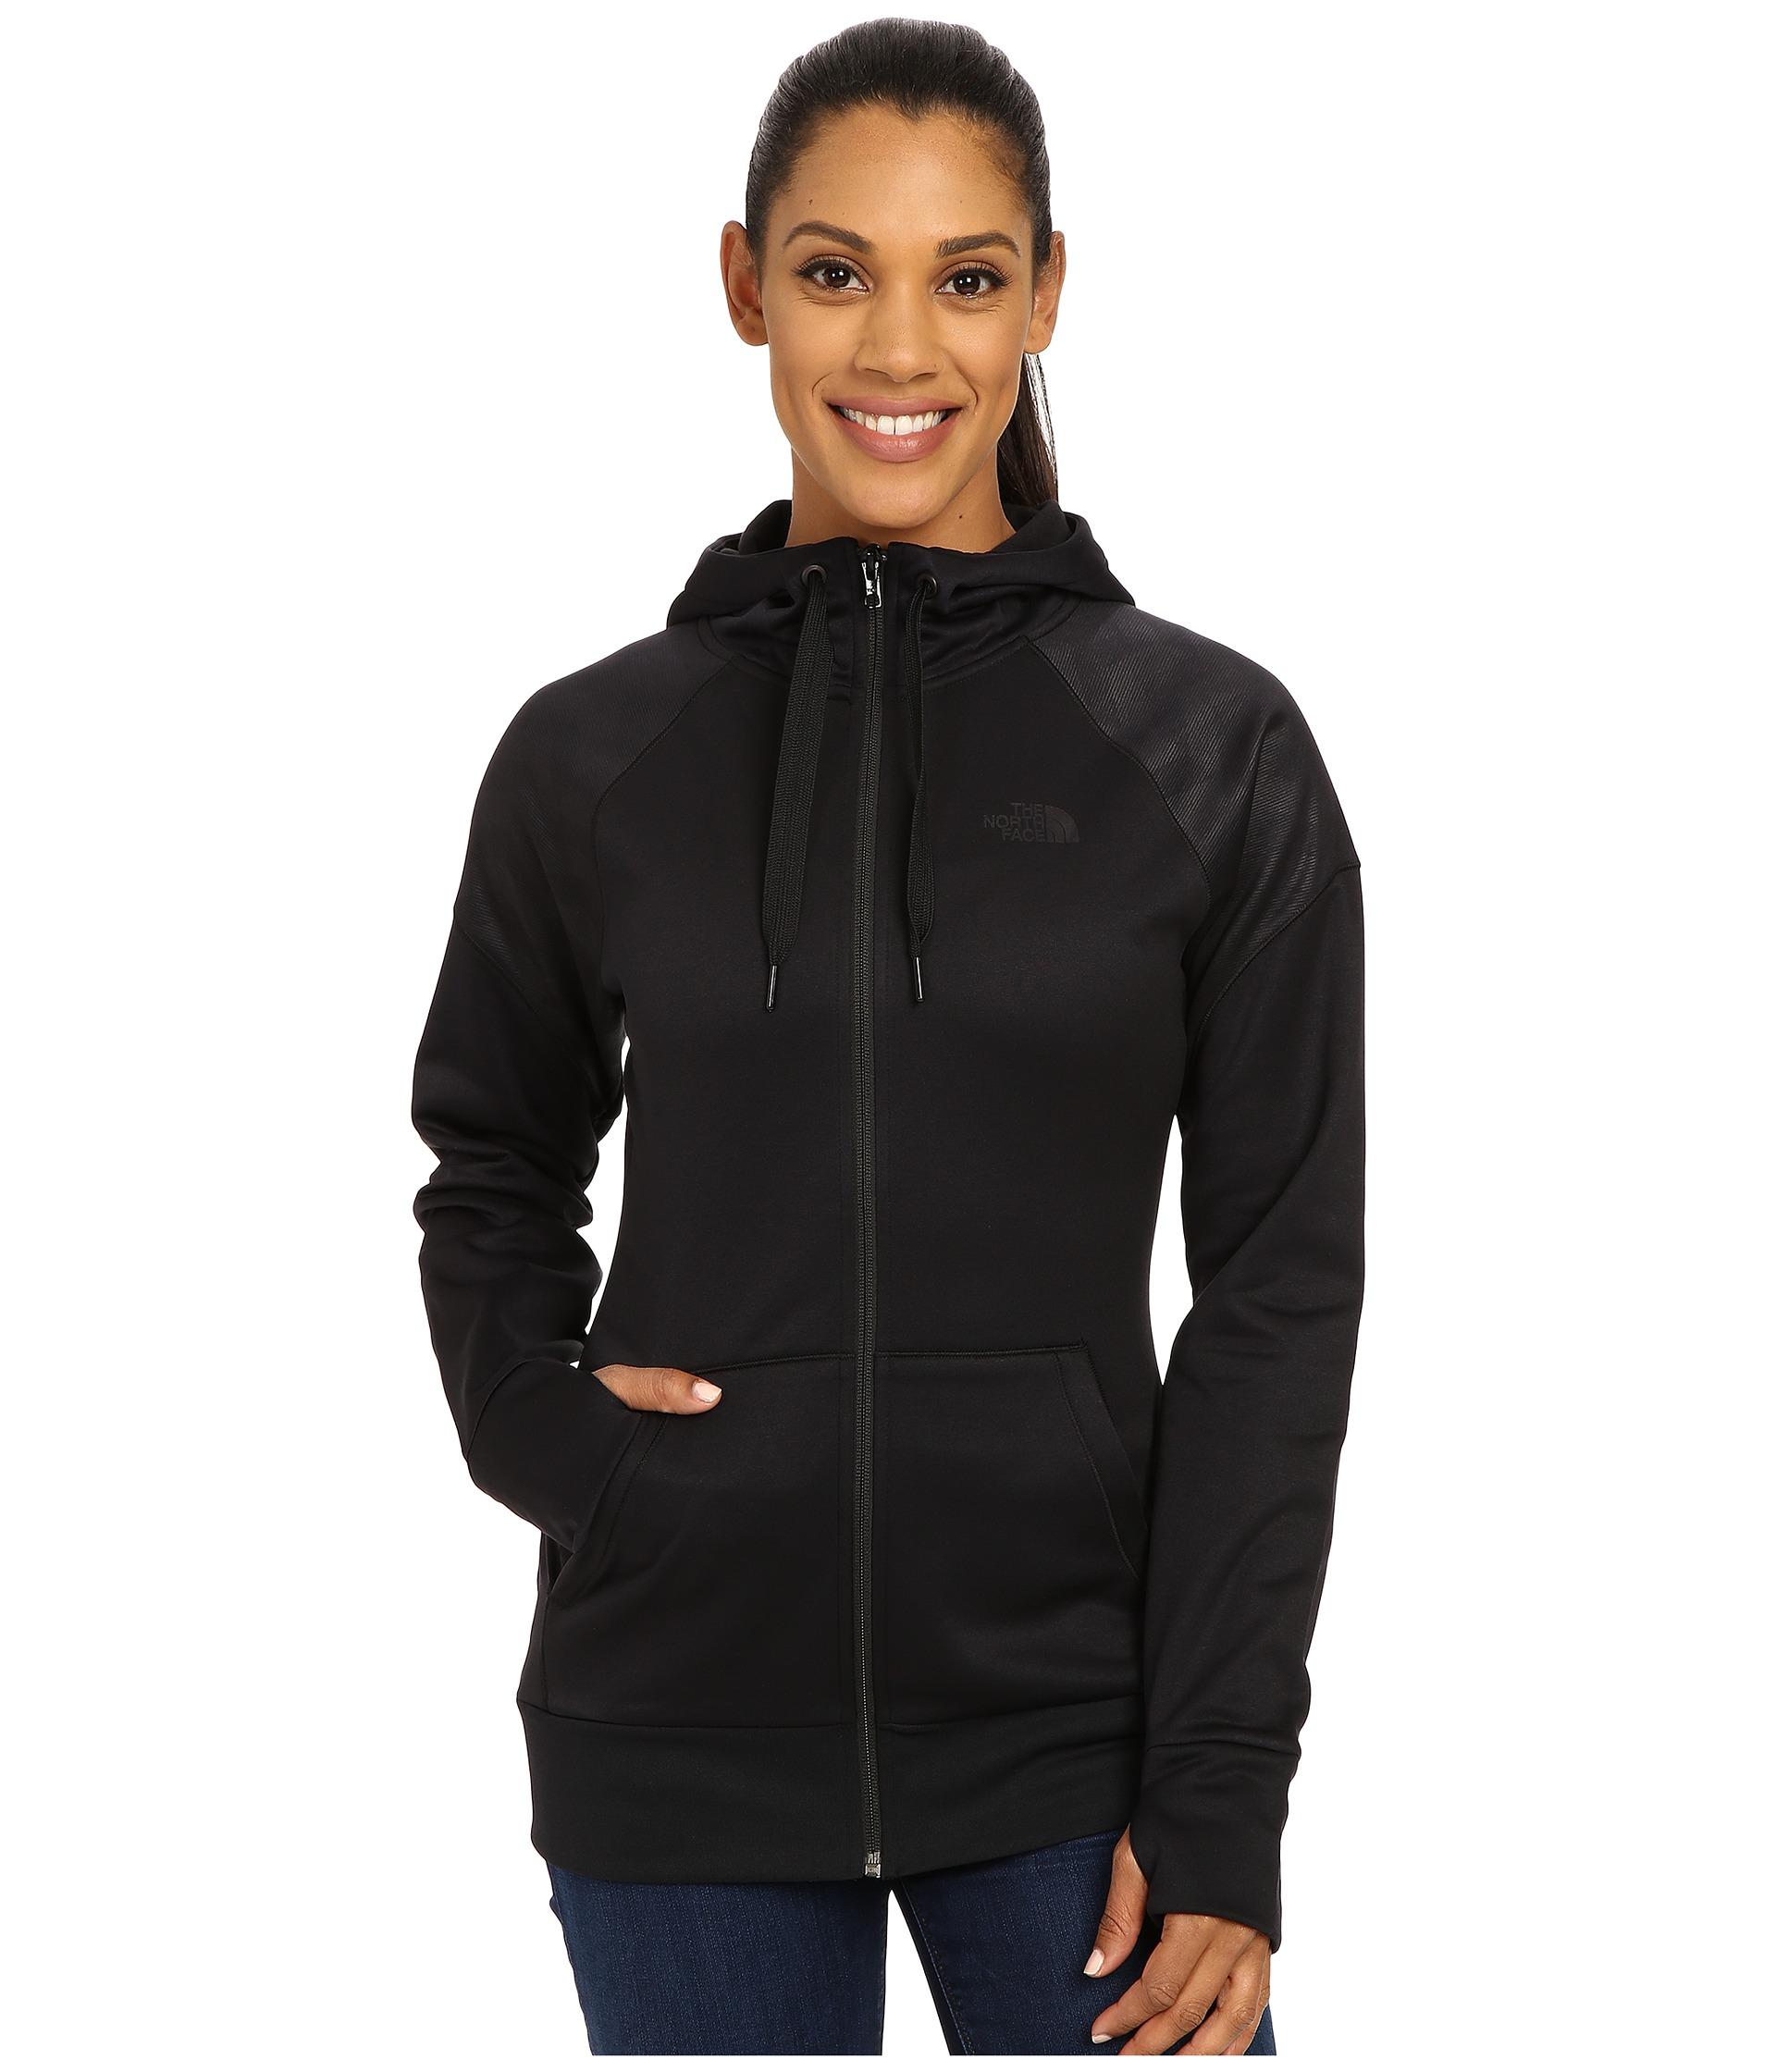 North face hoodies women